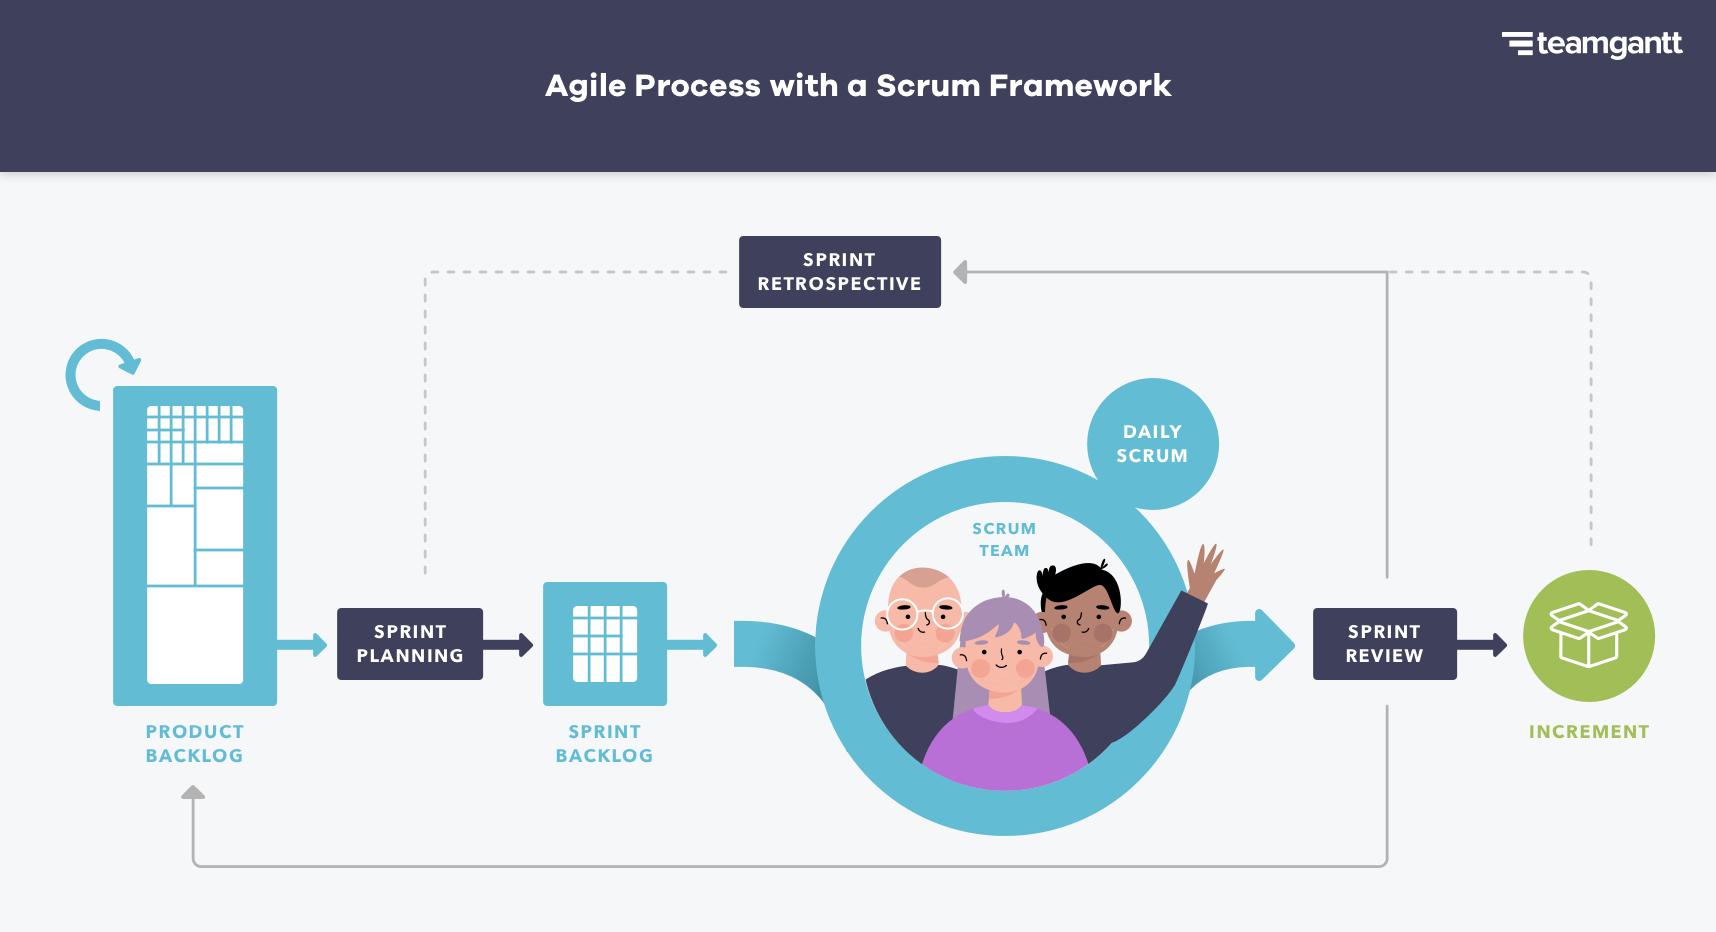 Agile process with a Scrum framework